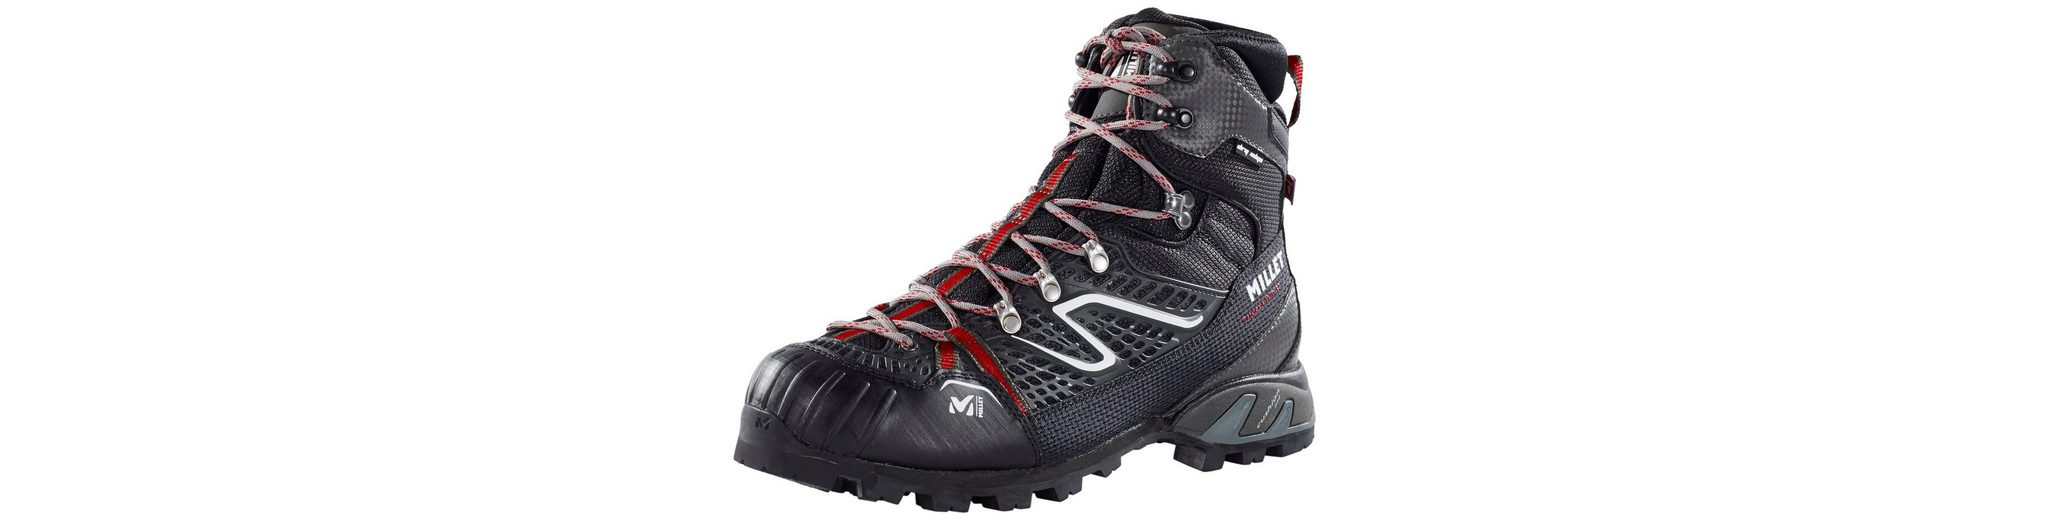 Millet Kletterschuh Trident Winter Shoes Men Freies Verschiffen Rabatt xQTrE